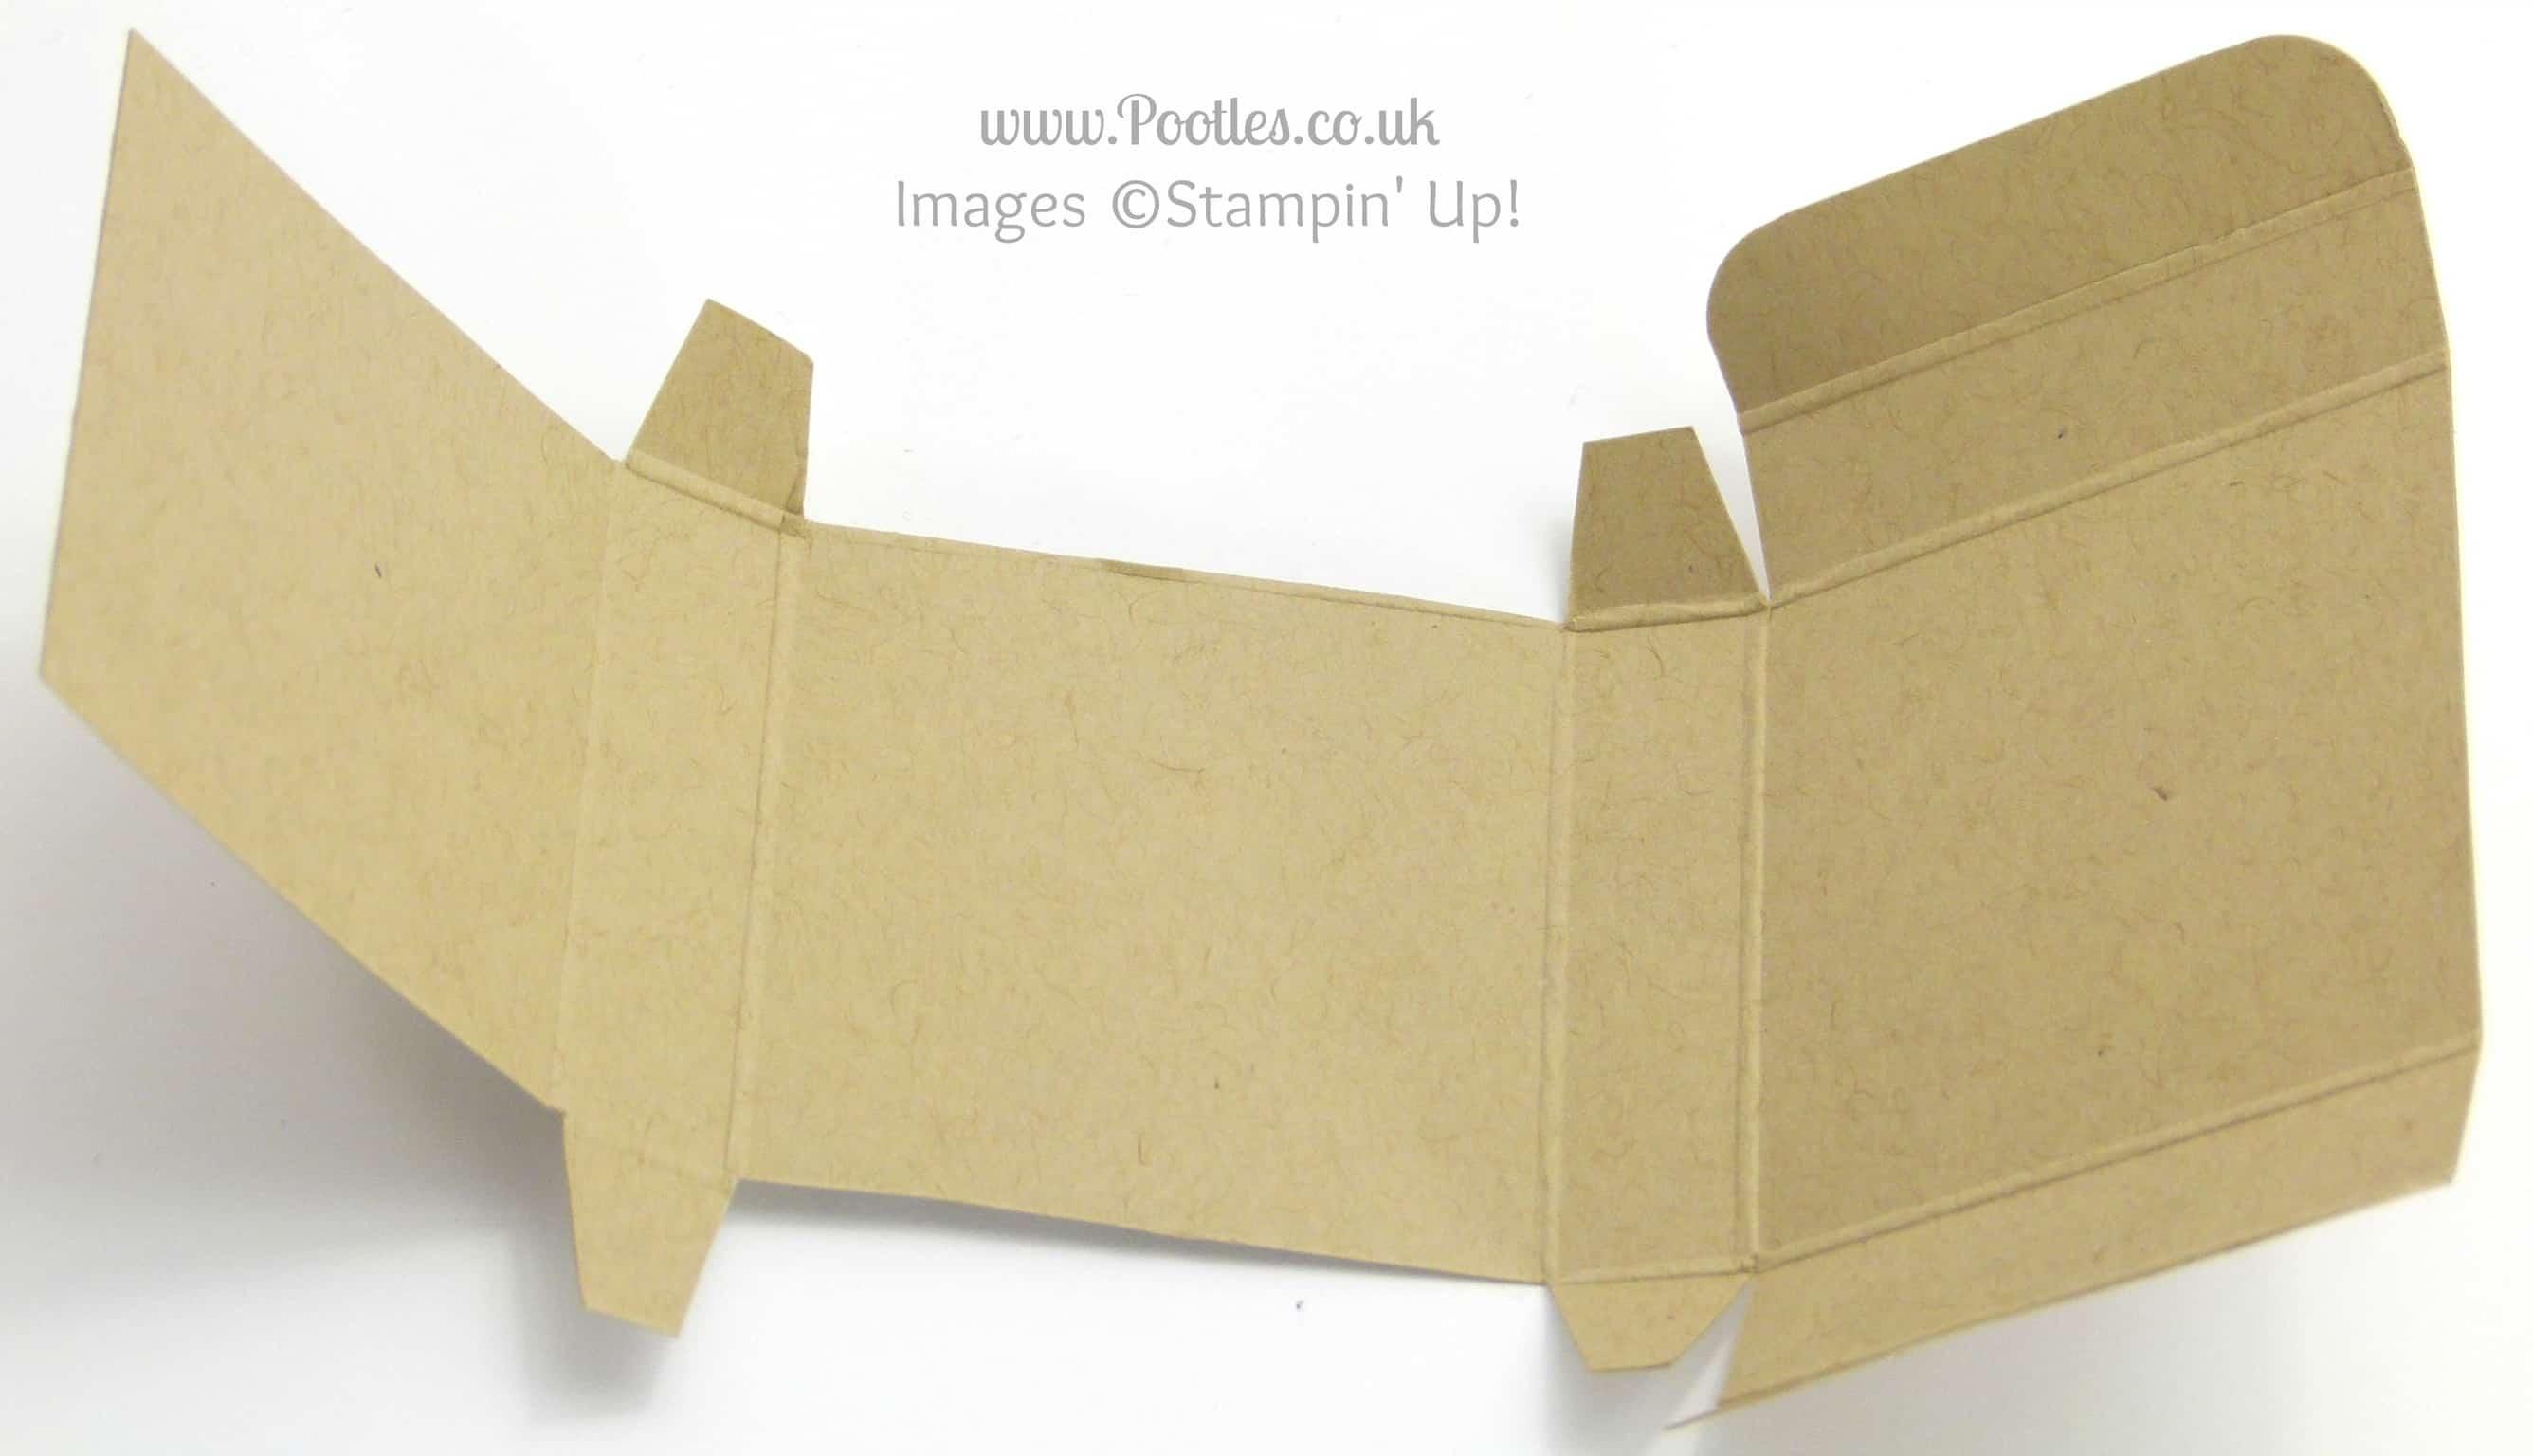 Stampin' up! UK Independent Demonstrator Pootles - No Stick Box Tutorial Unfolded